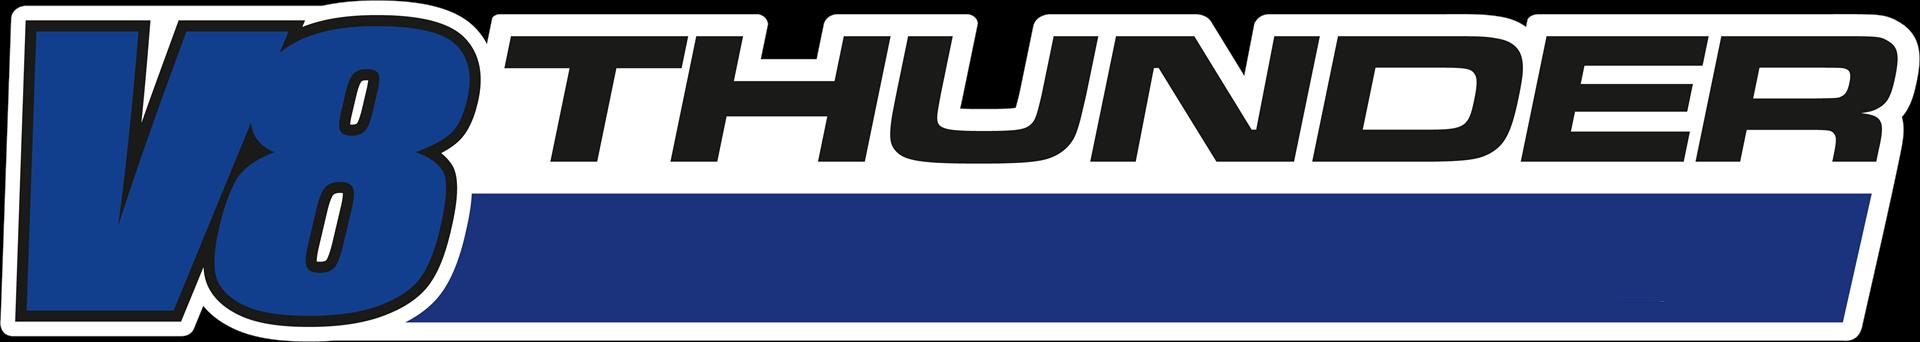 V8 Thunder logo